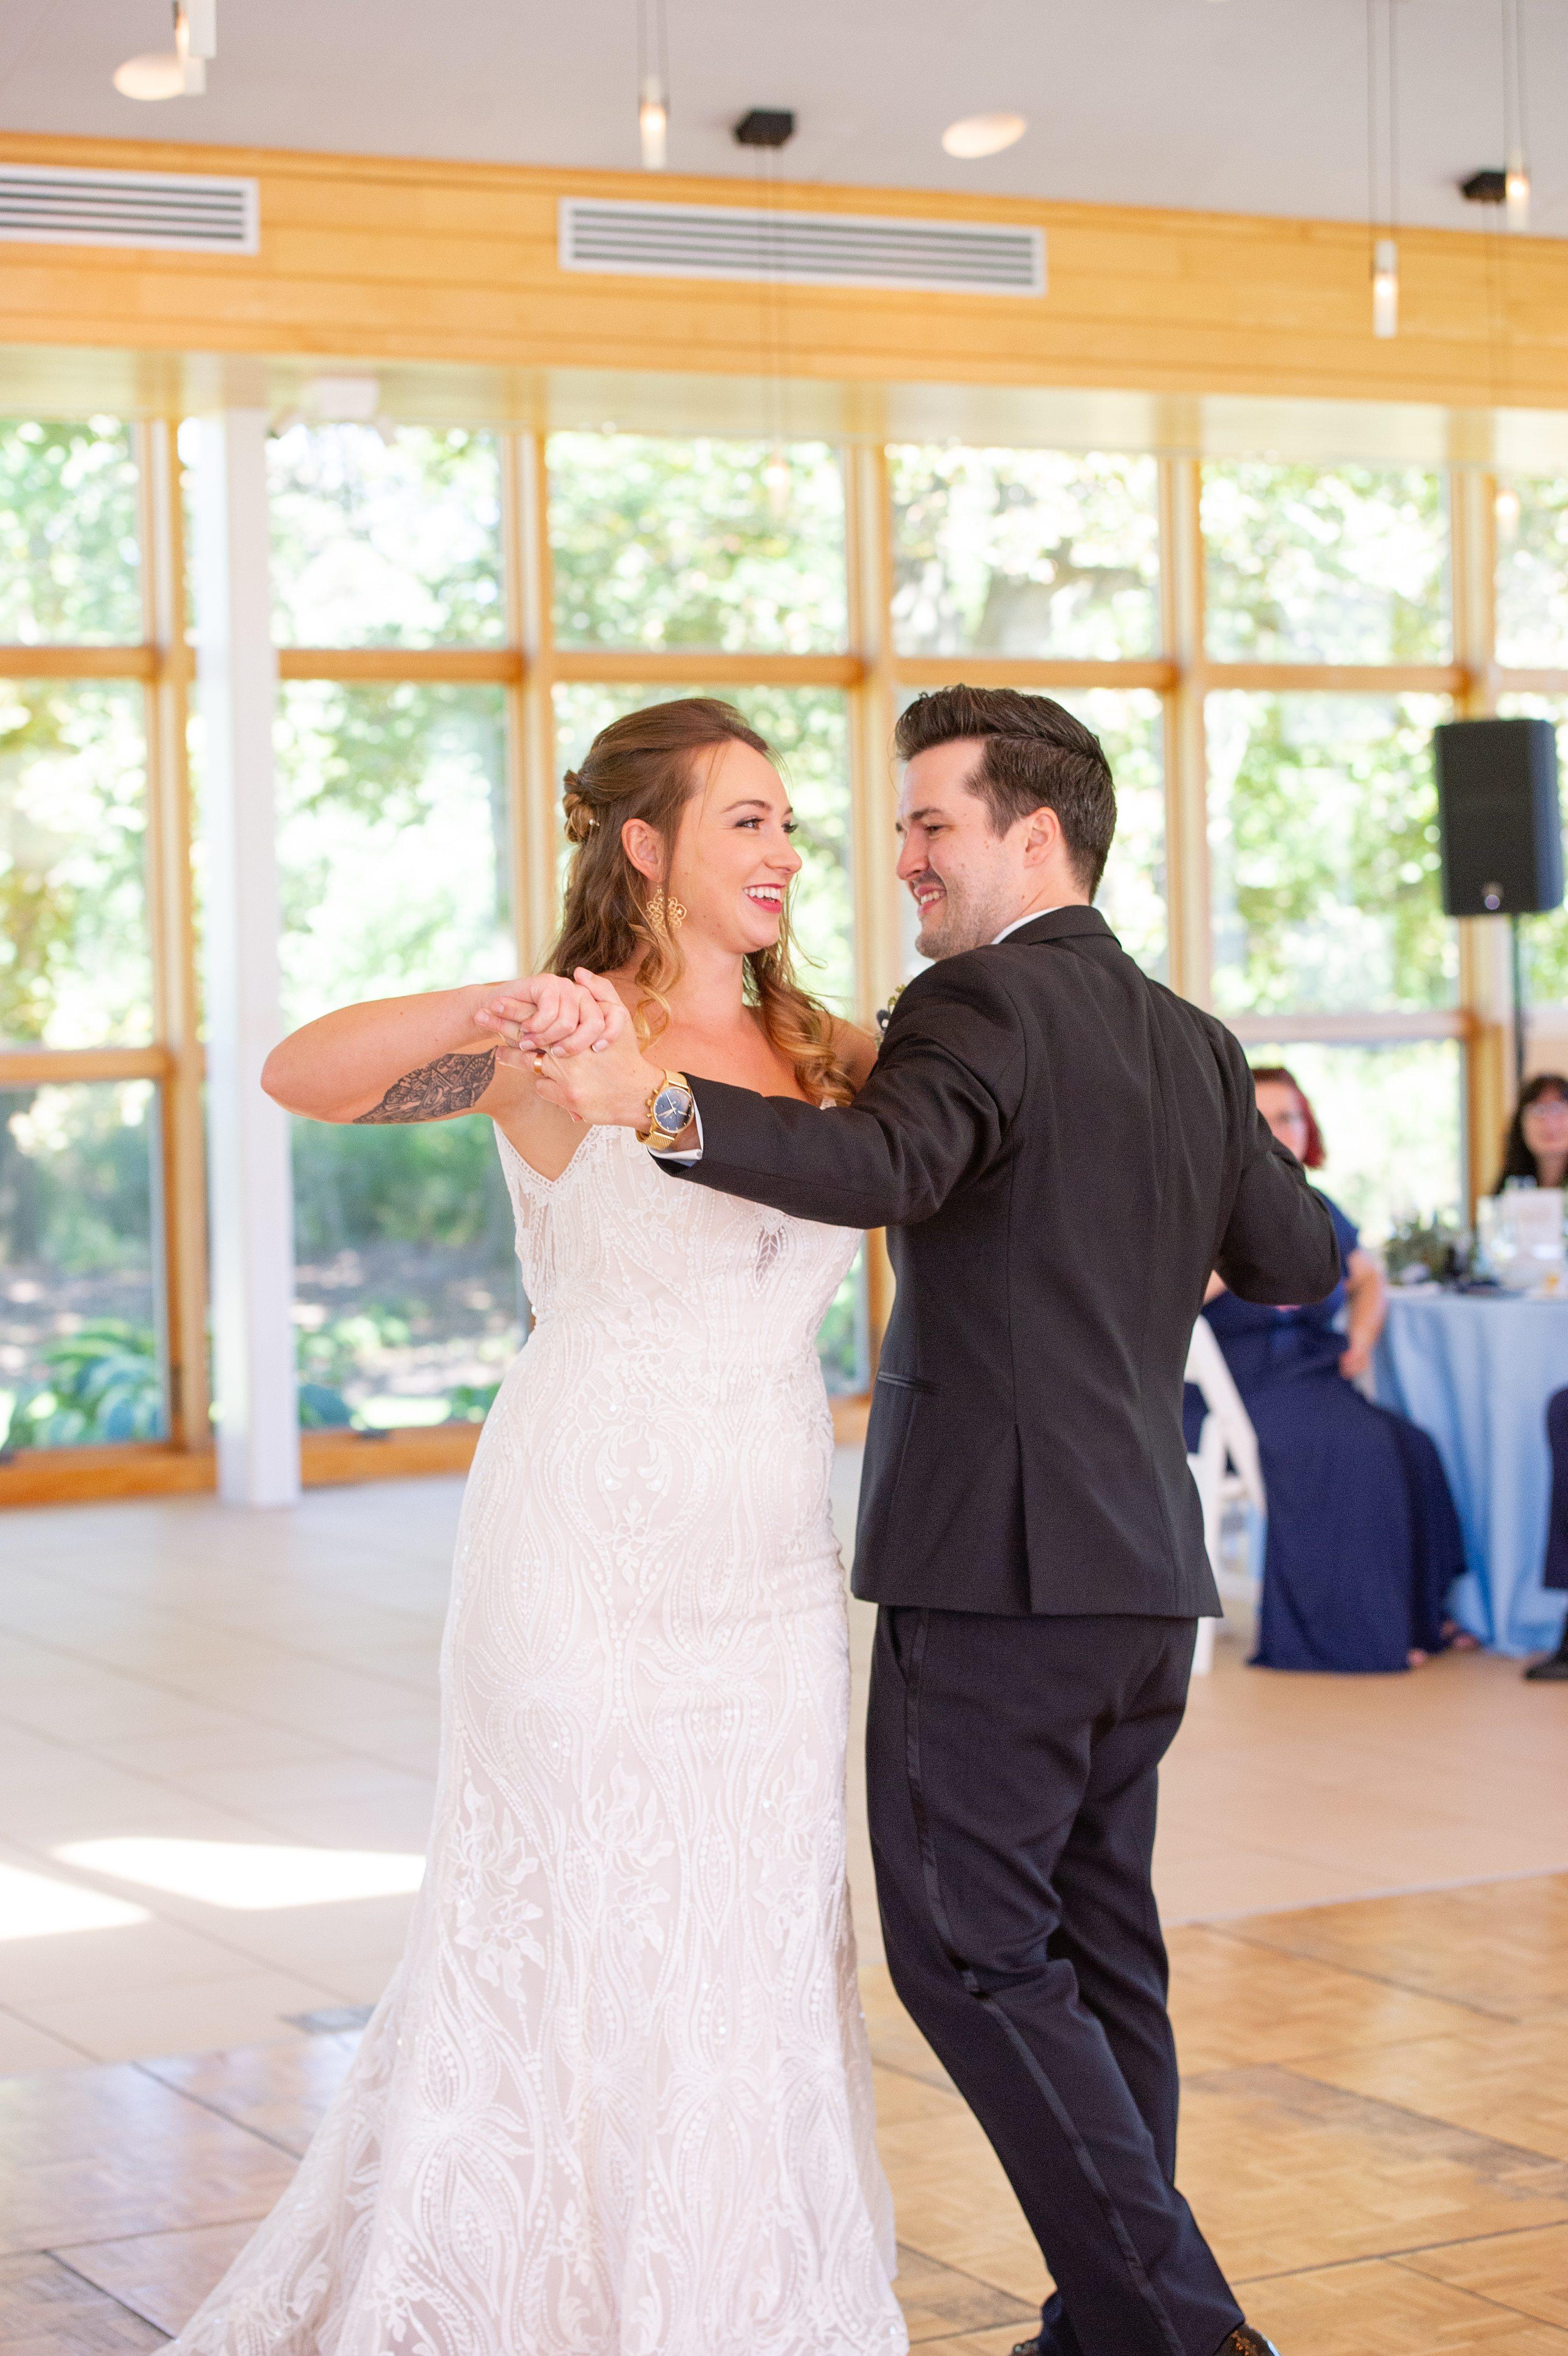 Danada House wedding, Laura Meyer